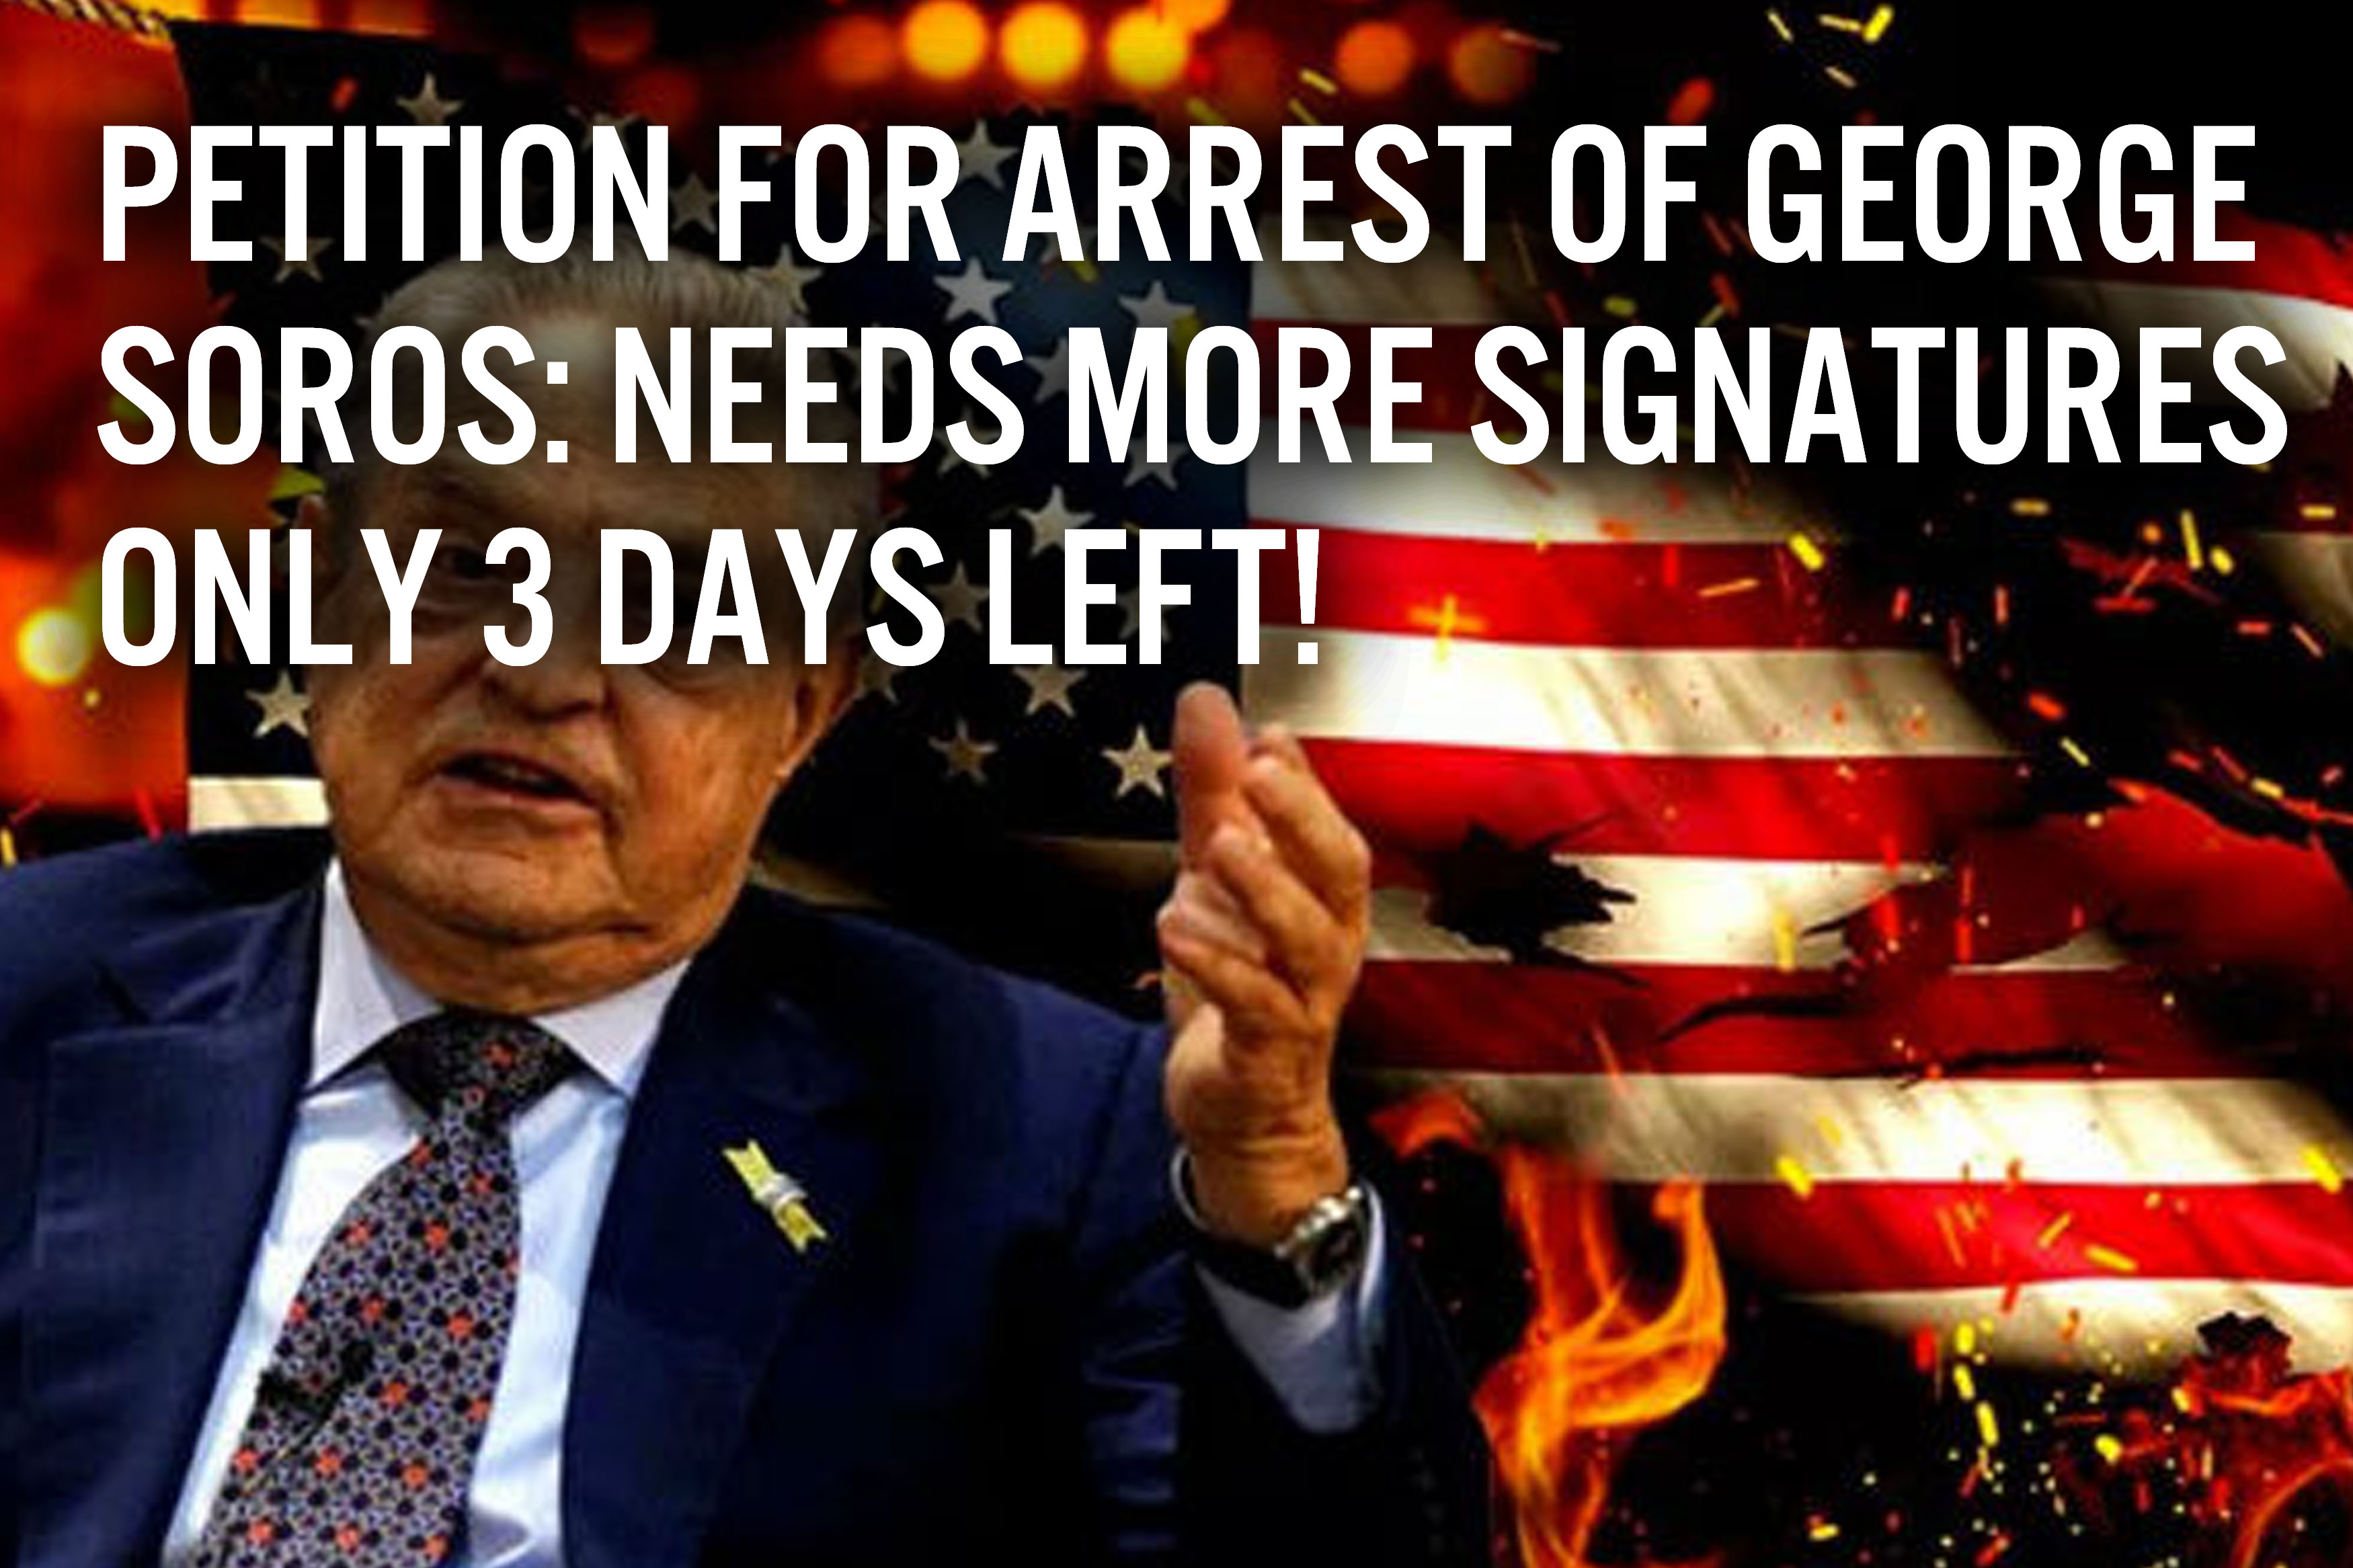 Petition Soros